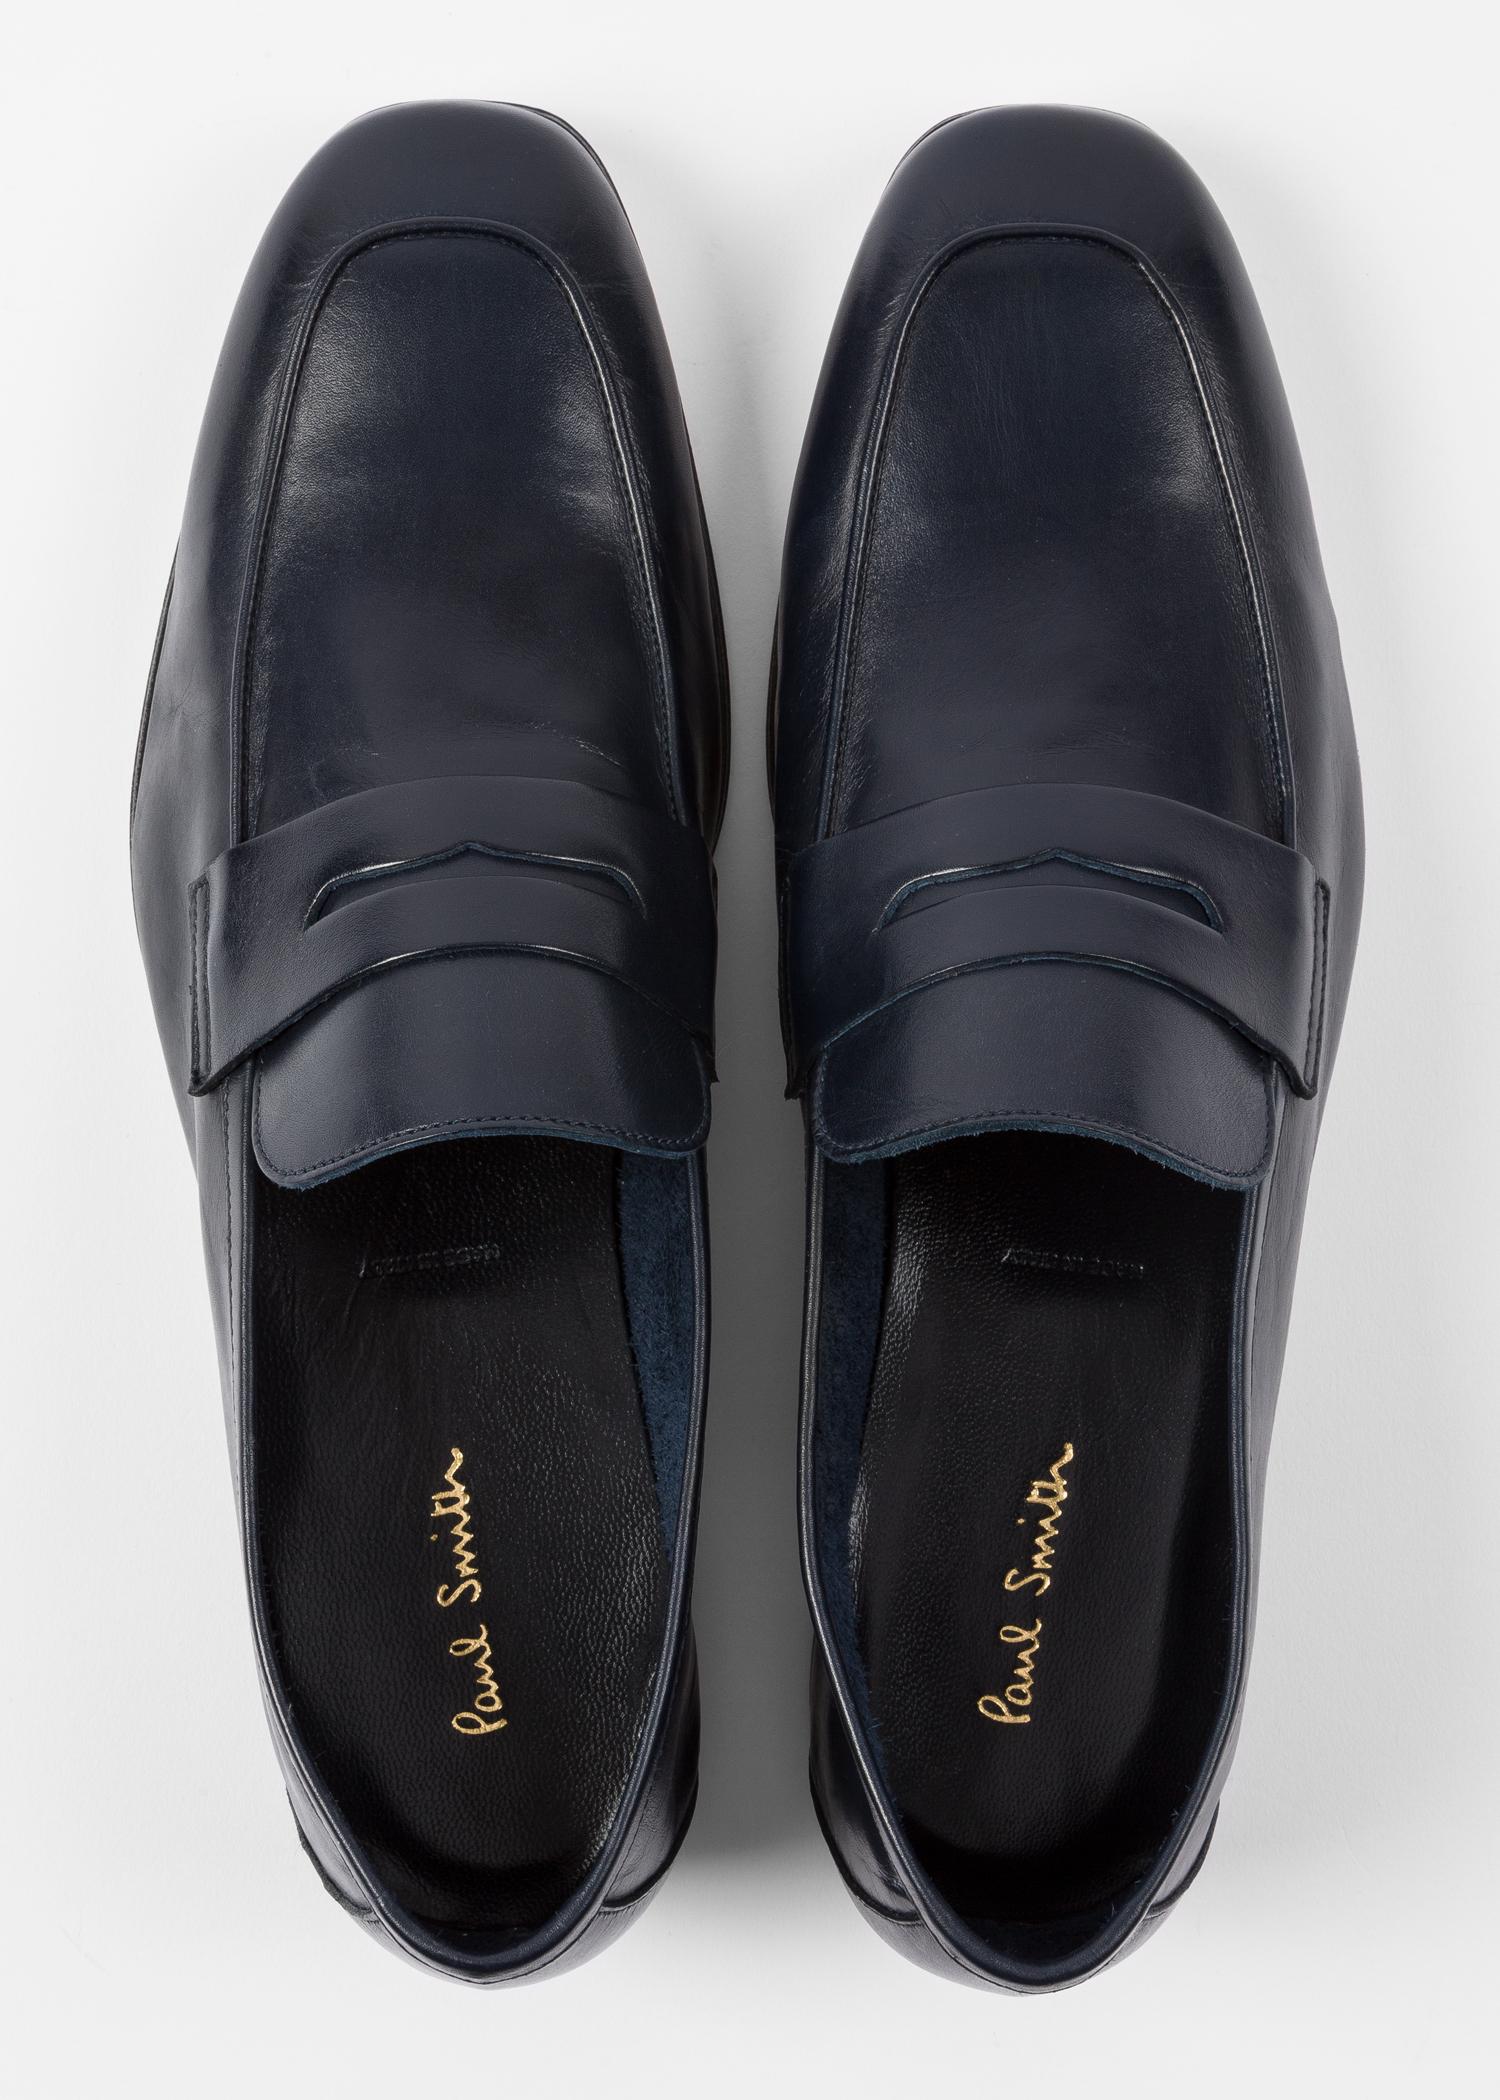 2375798d8cd Men s Dark Navy Leather  Glynn  Penny Loafers - Paul Smith Hong Kong